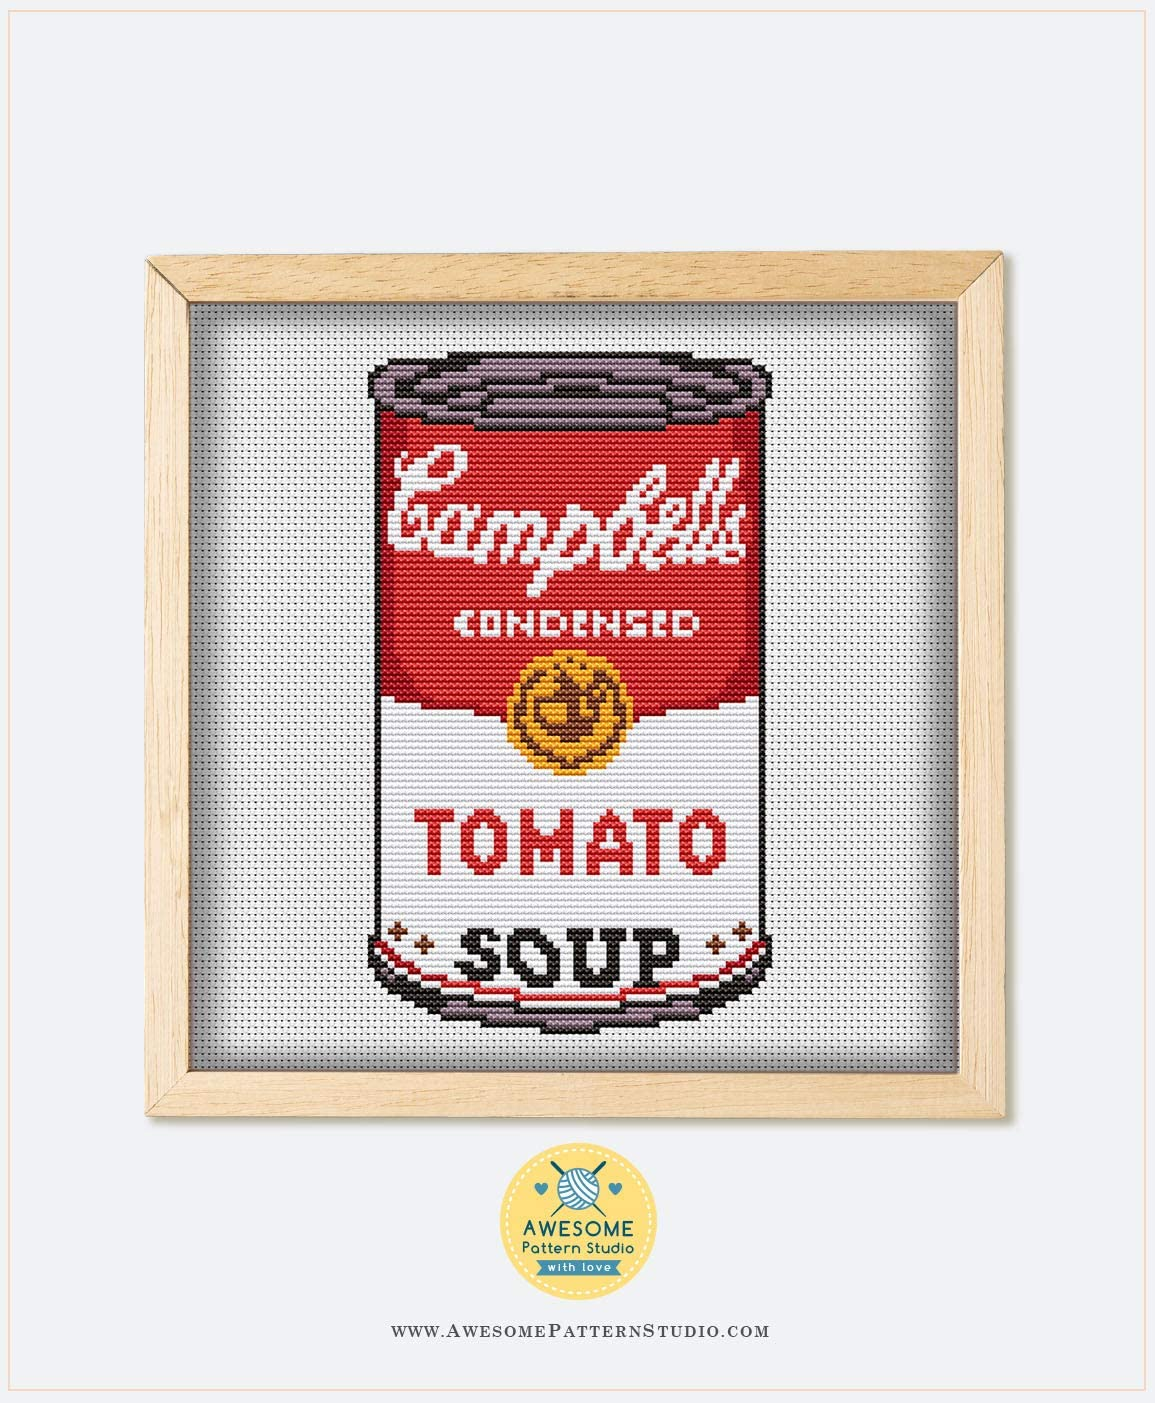 Stitch Design Stitching Cross Stitch Designs Embroidery Kits Campbell Tomato Soup #K494 Embroidery Cross Stitch Kit Cross Designs